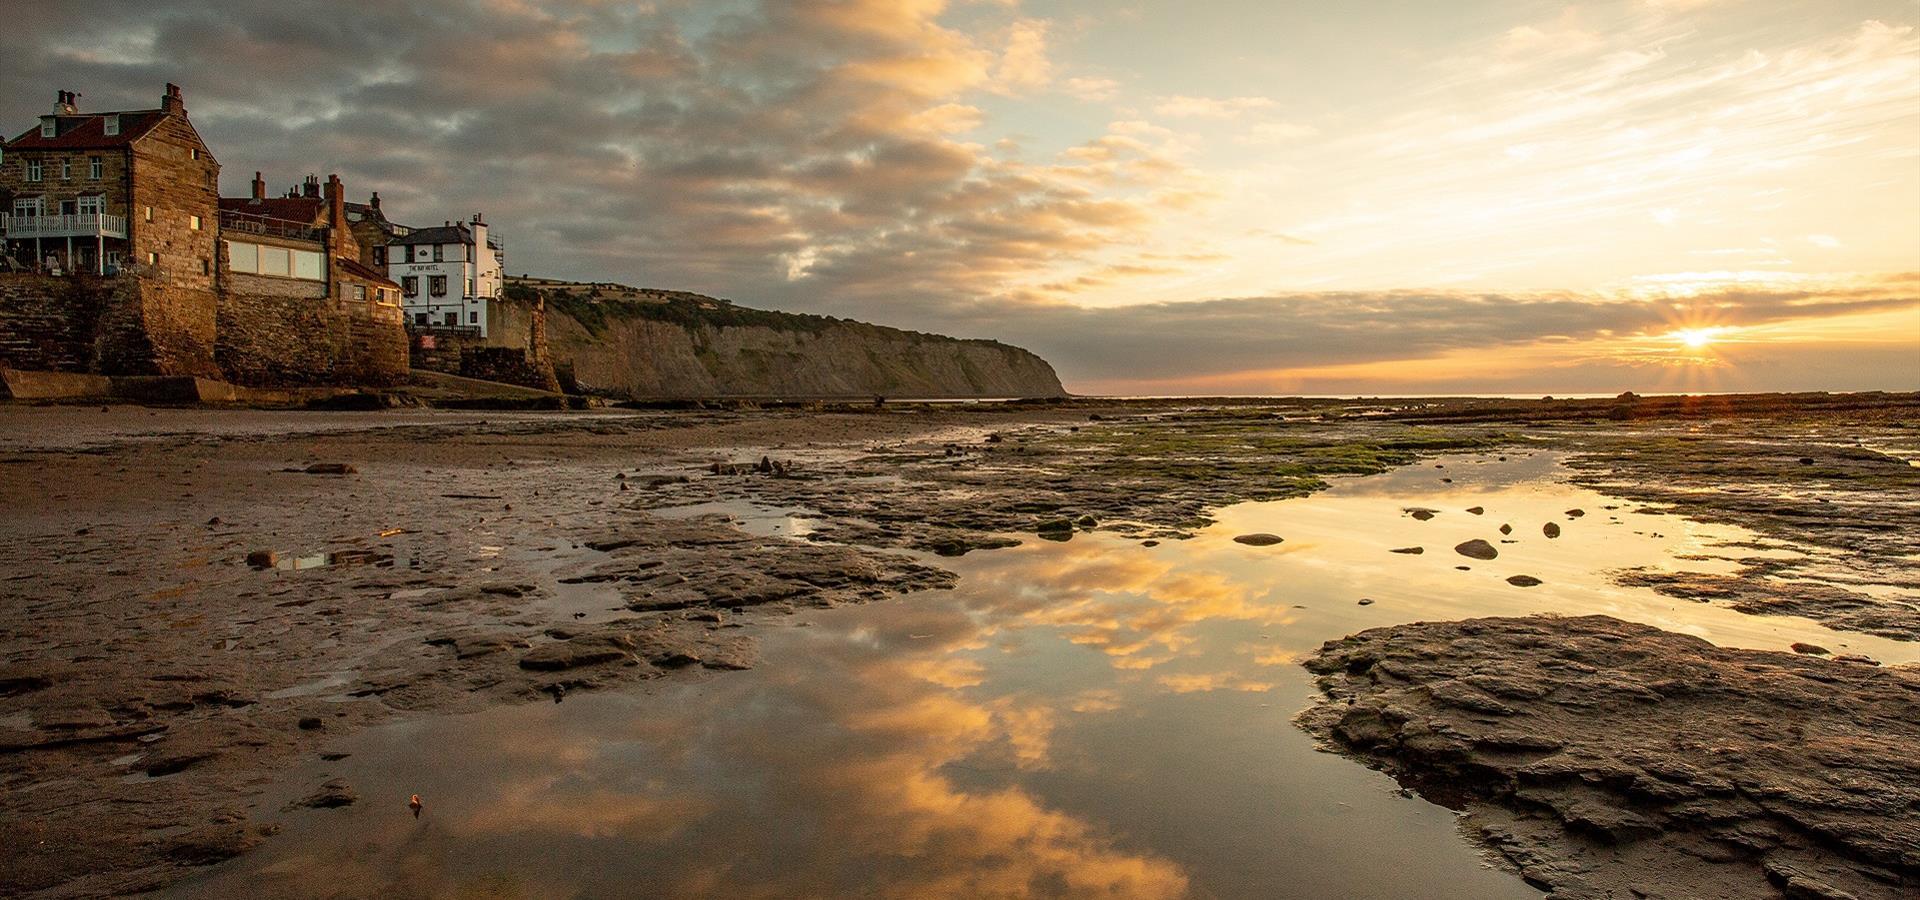 An image of Robin Hood's Bay, Beach at Dusk - By Duncan Lomax